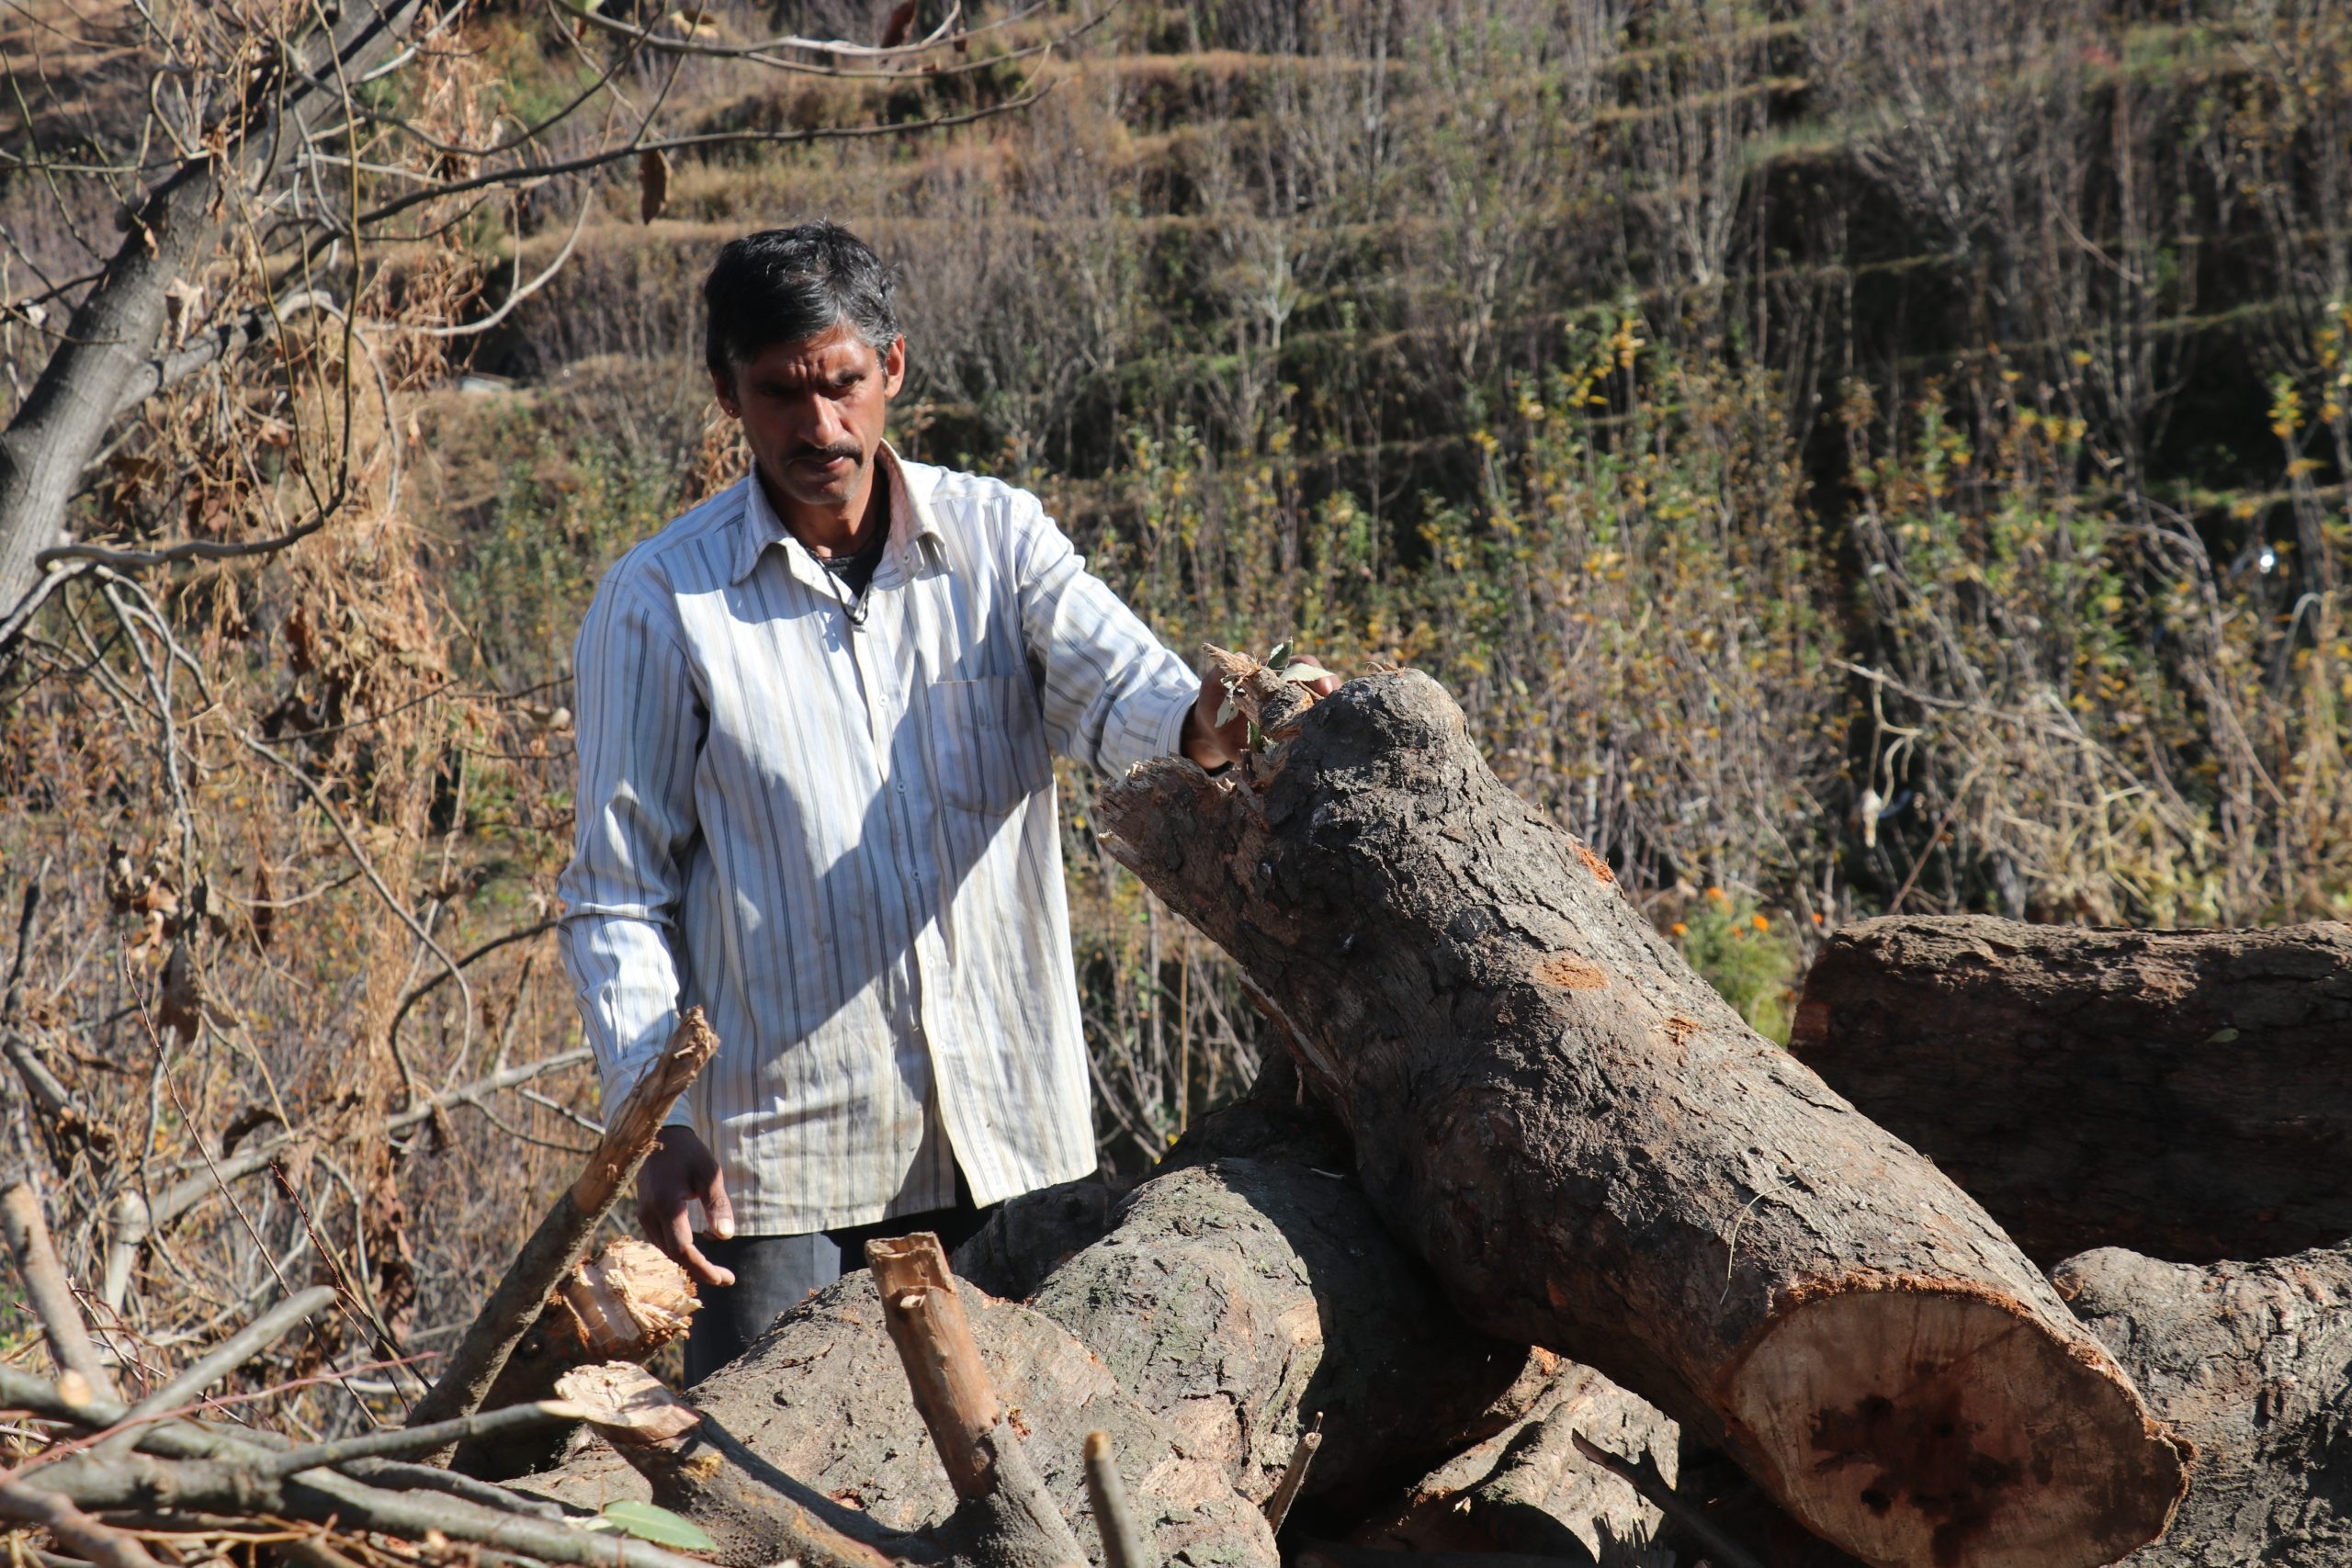 A man near wood logs